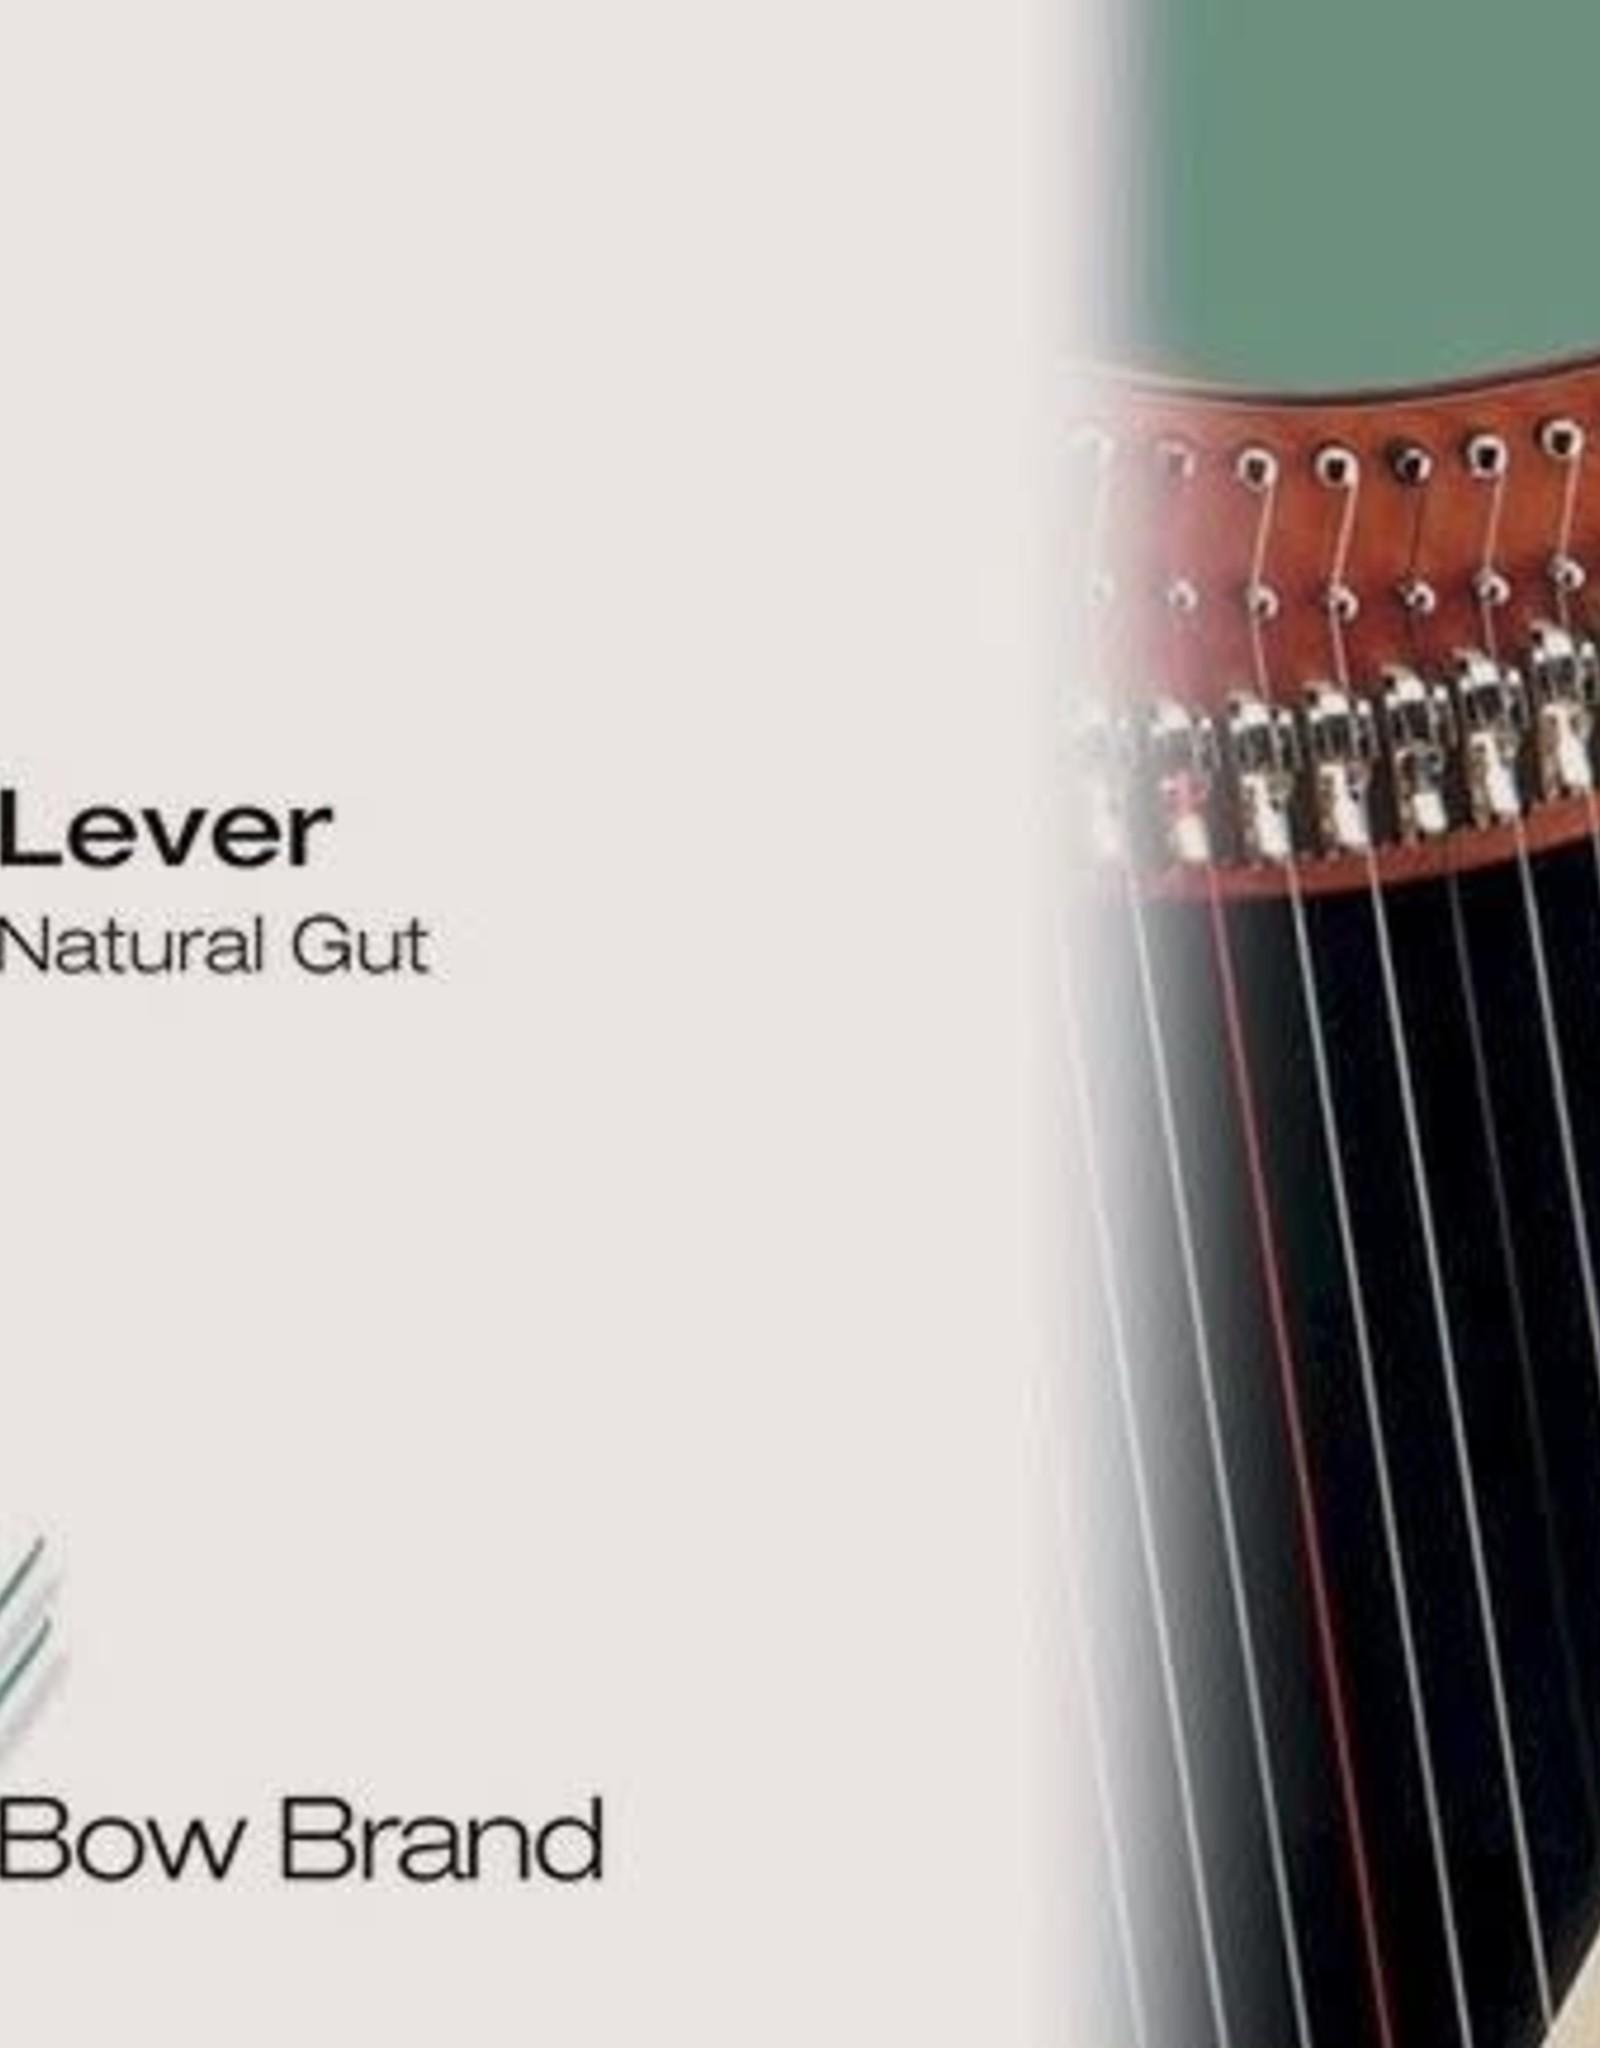 BOW BRAND  klep darm - lever GUT (set) 2de octaaf - inclusief 5% korting